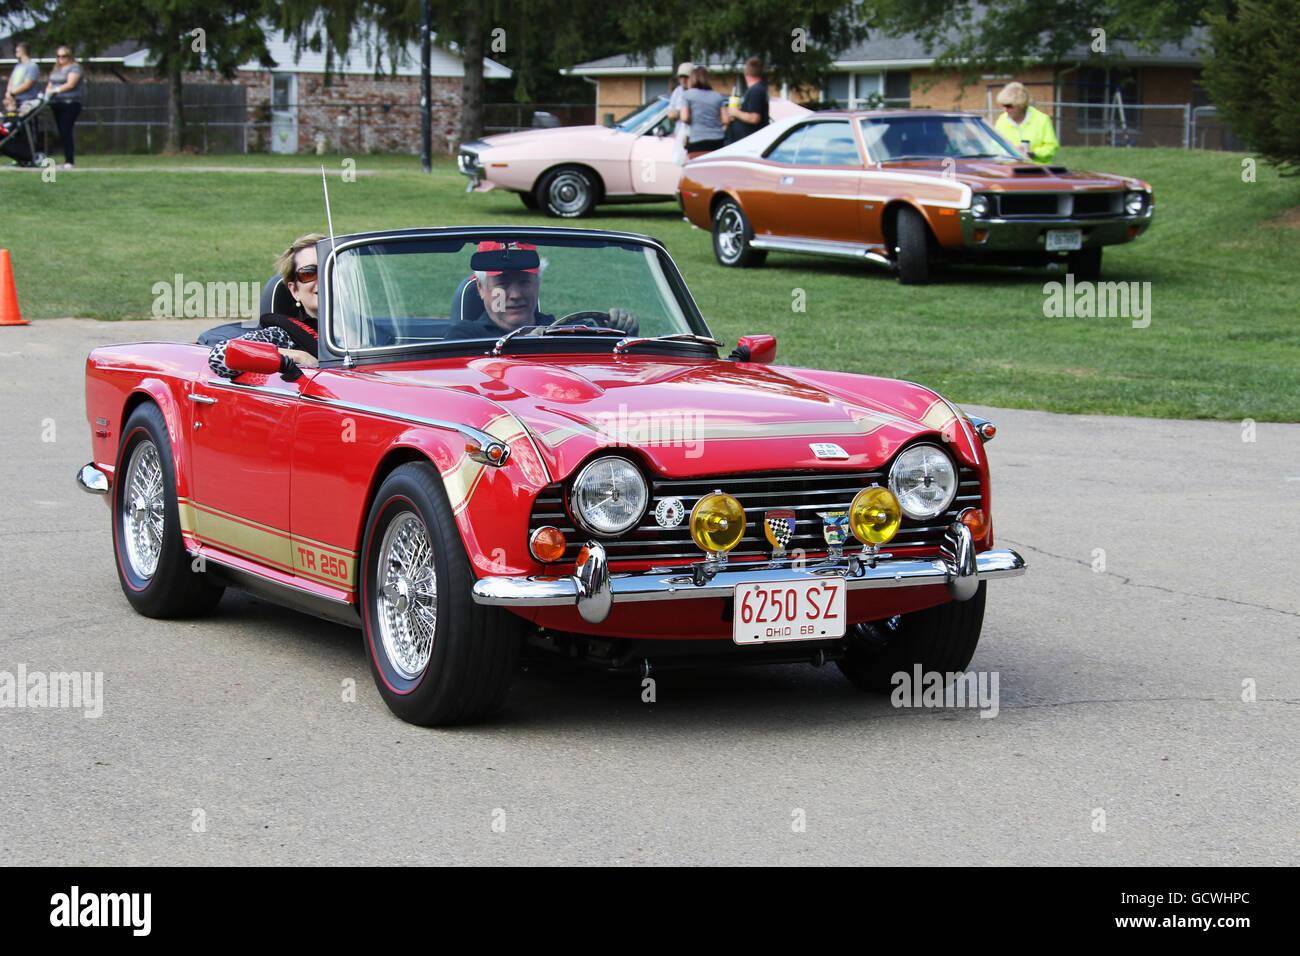 Auto- 1968 Triumph TR 250. Red. Convertible. Beavercreek Popcorn Festival. Beavercreek, Dayton, Ohio, USA. 6250SZ. - Stock Image